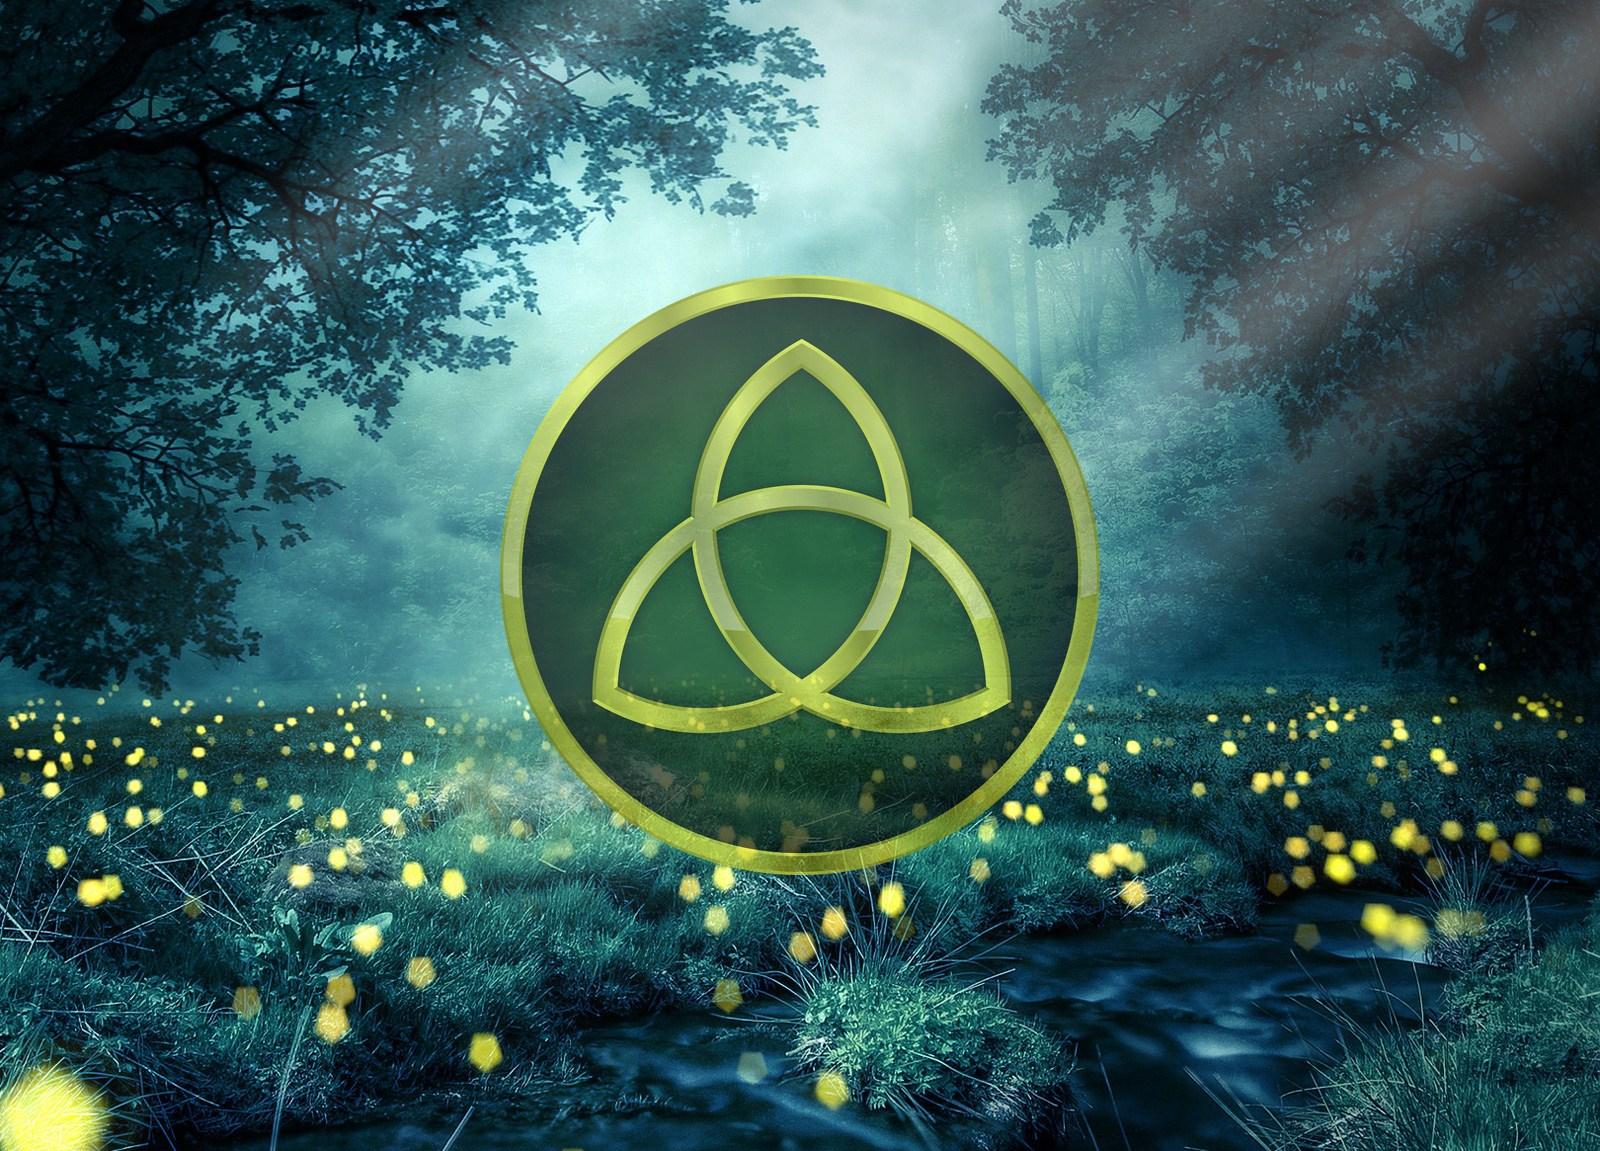 - An Arcane Symbol for Heart